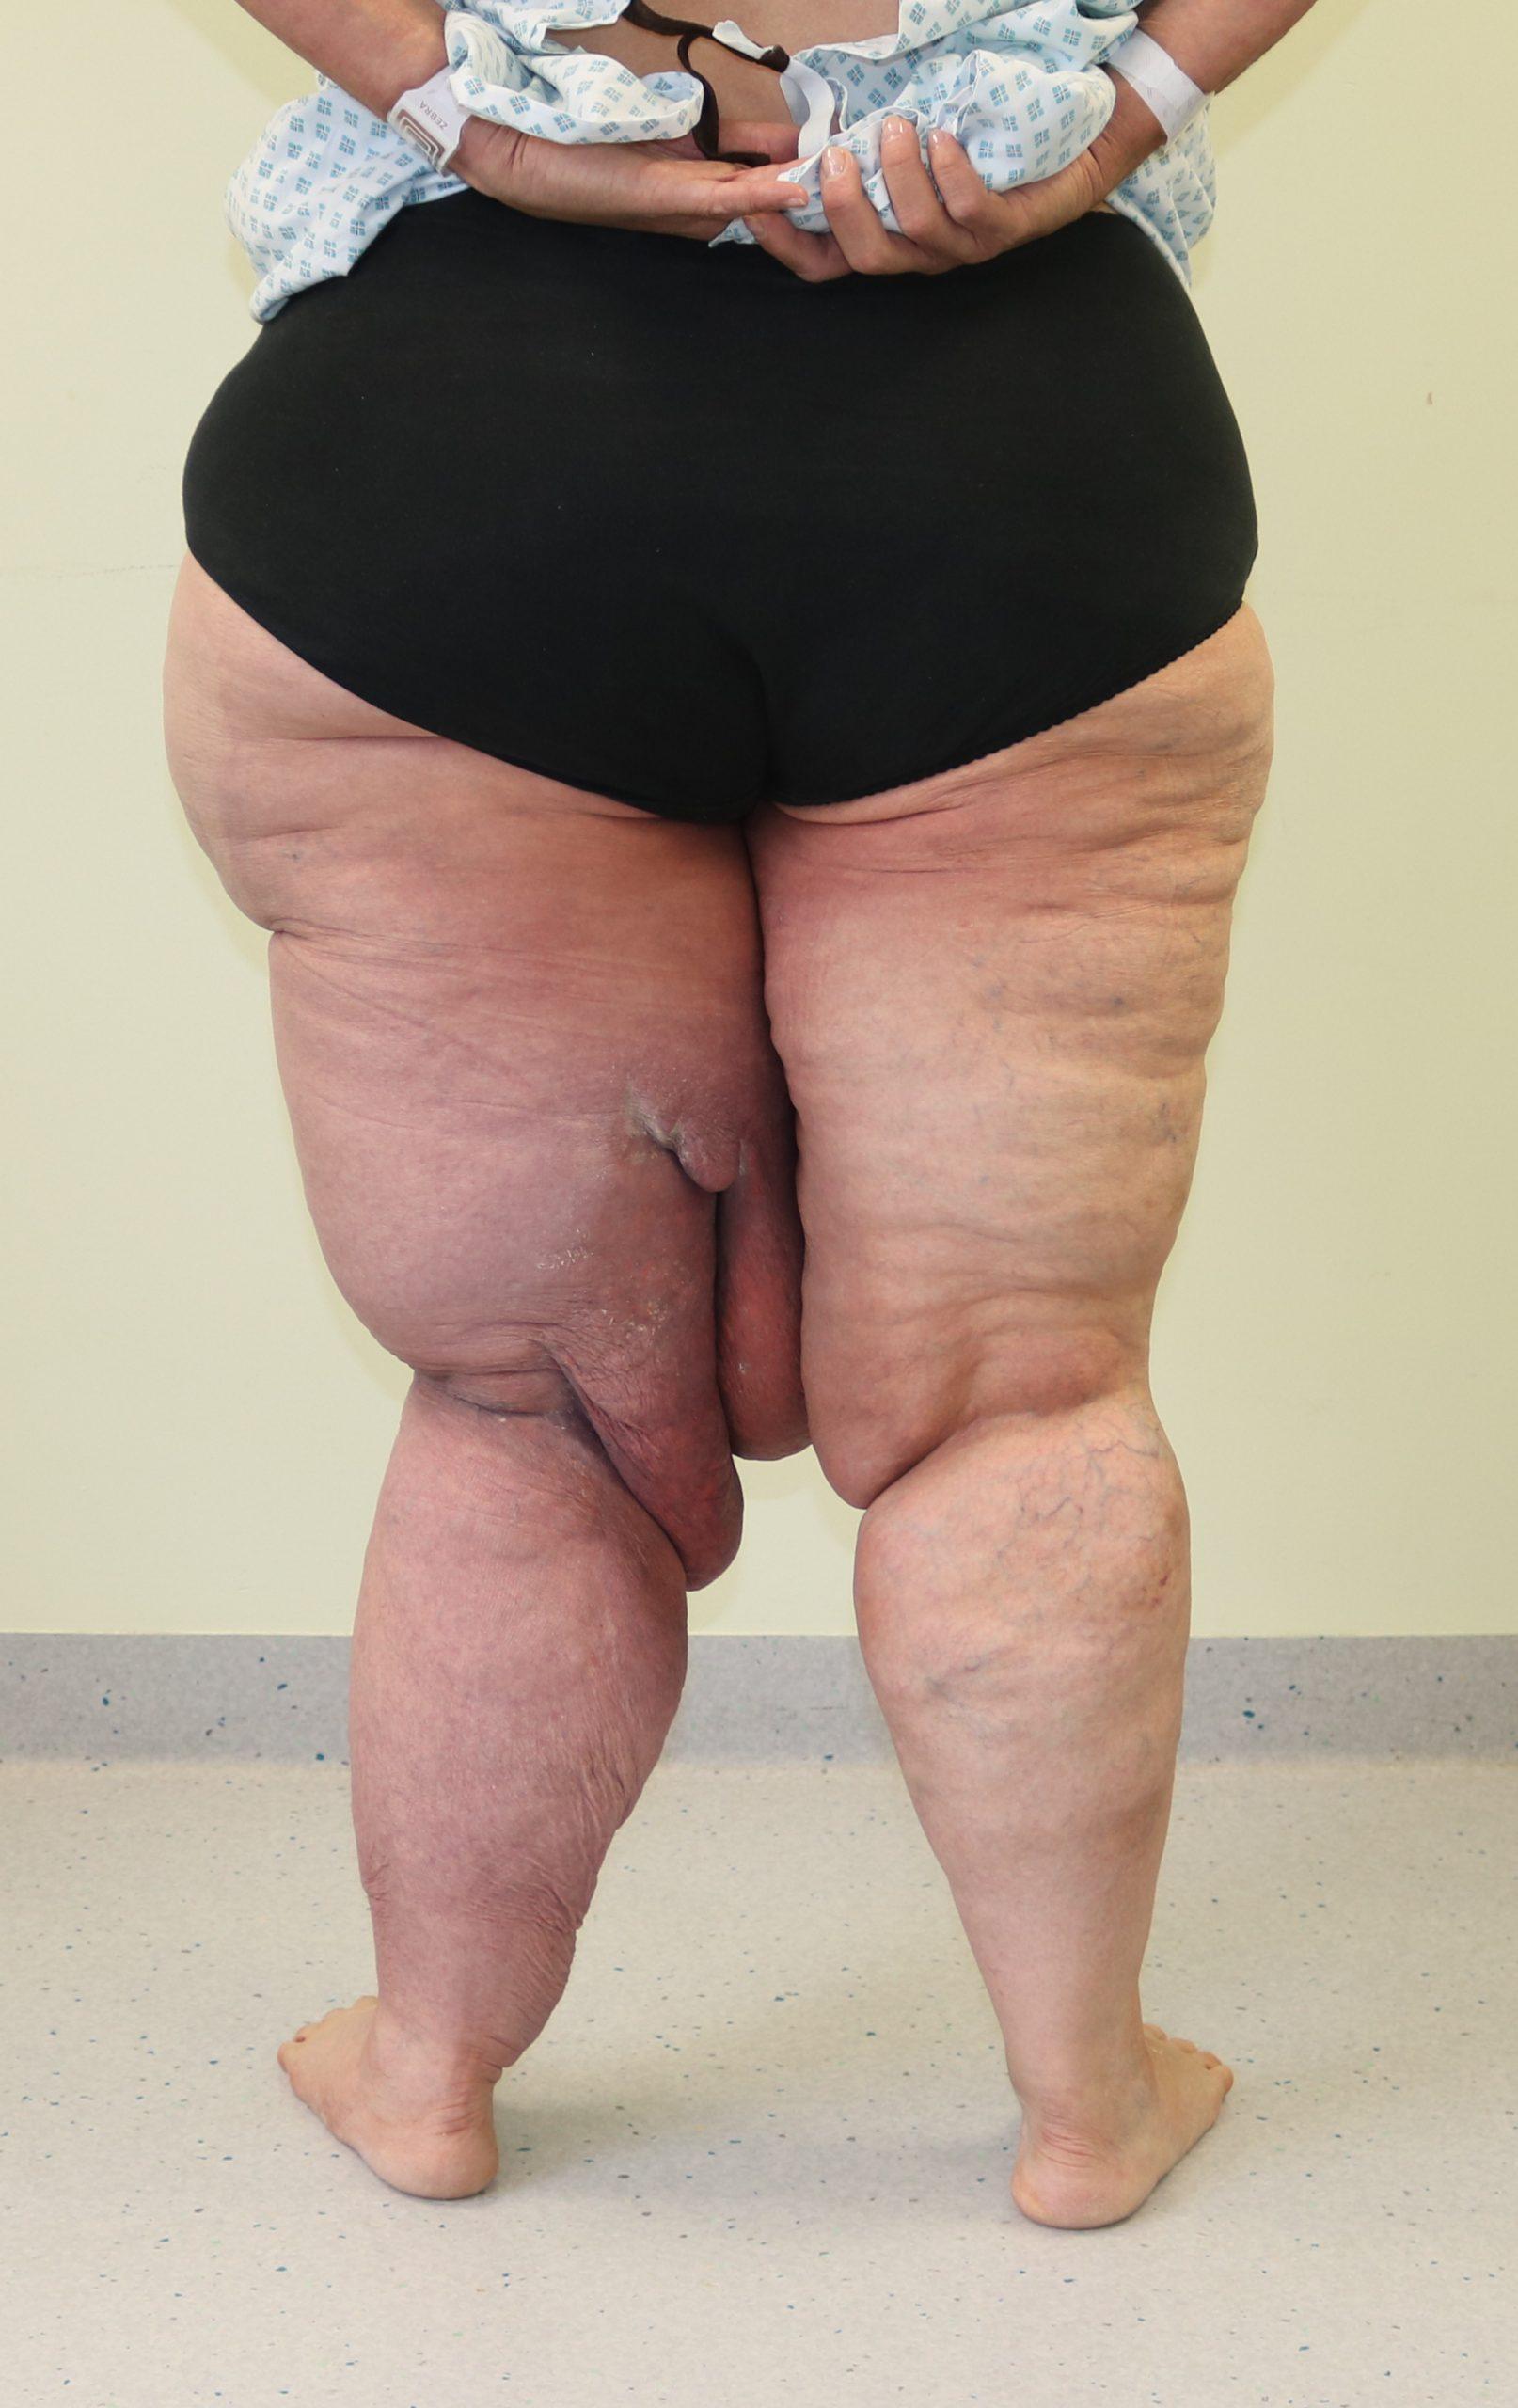 Lymphoedema Surgery